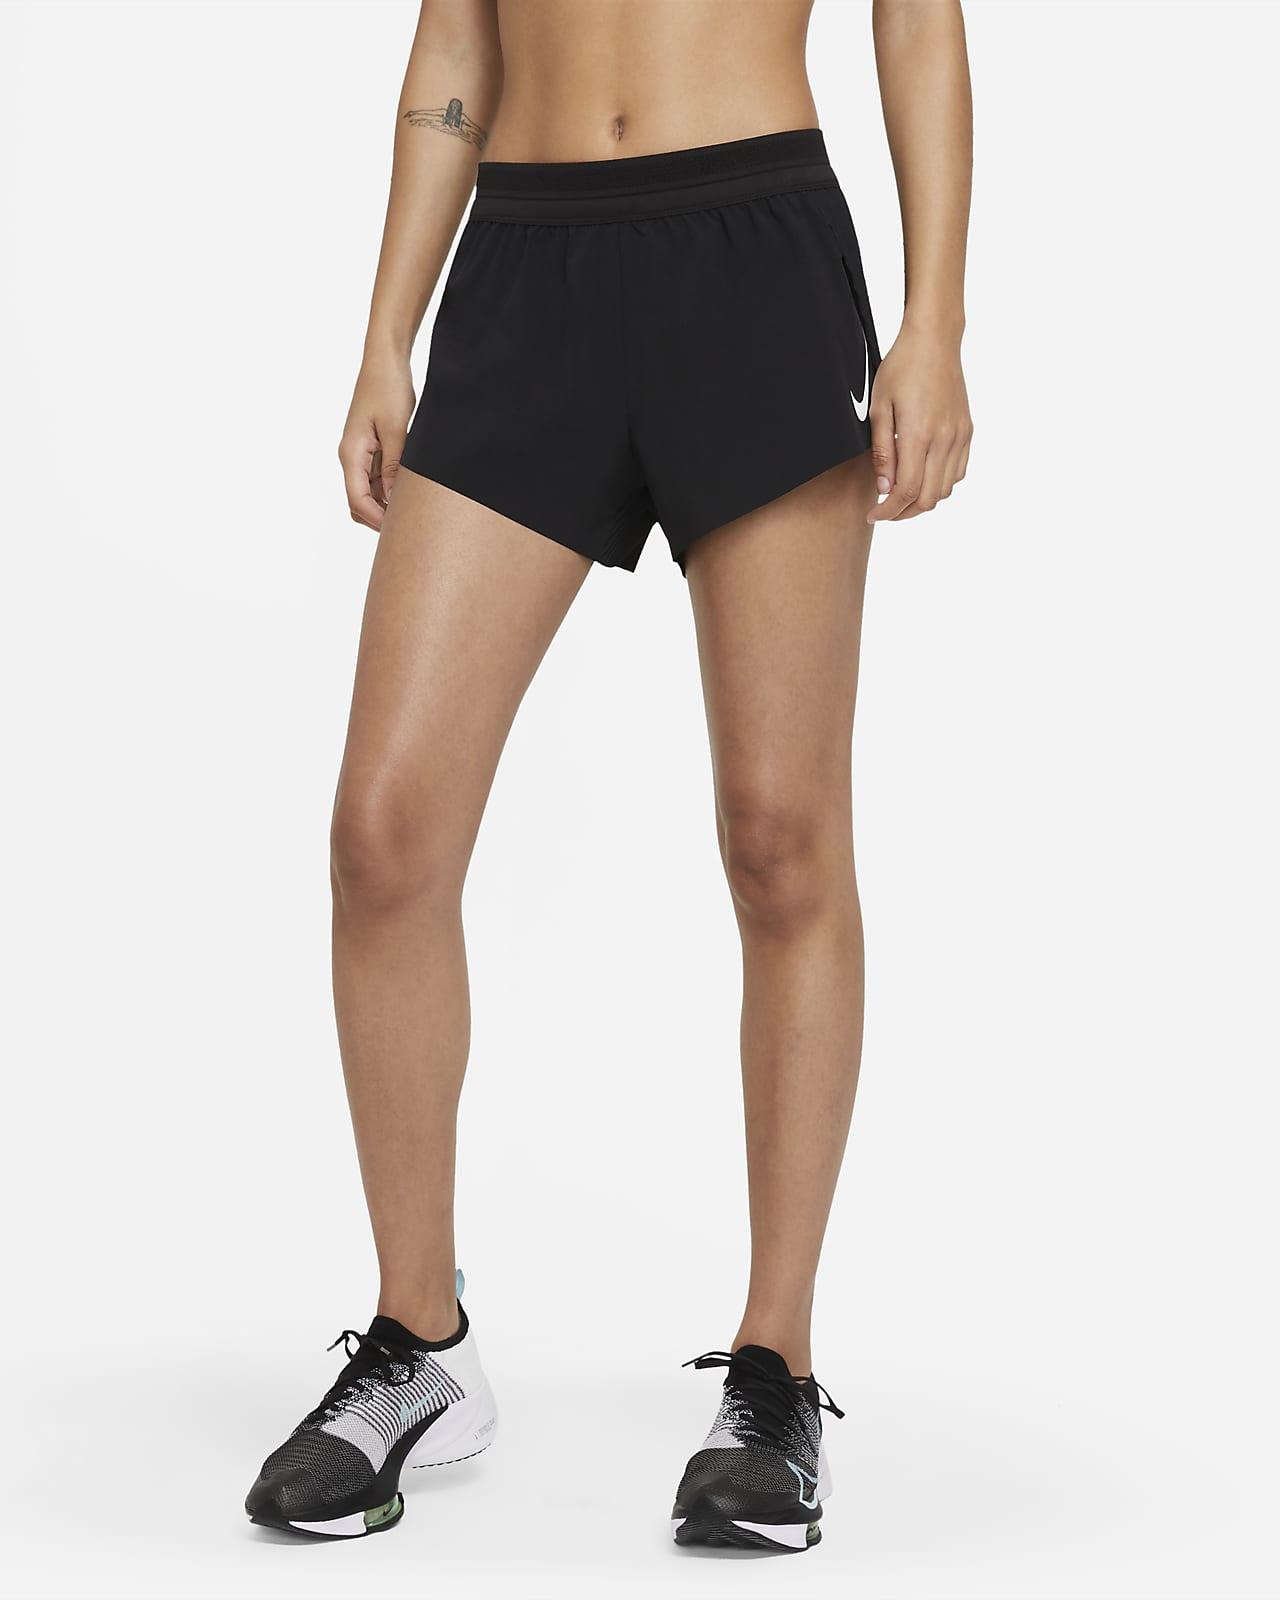 Shorts de running para mujer Nike AeroSwift